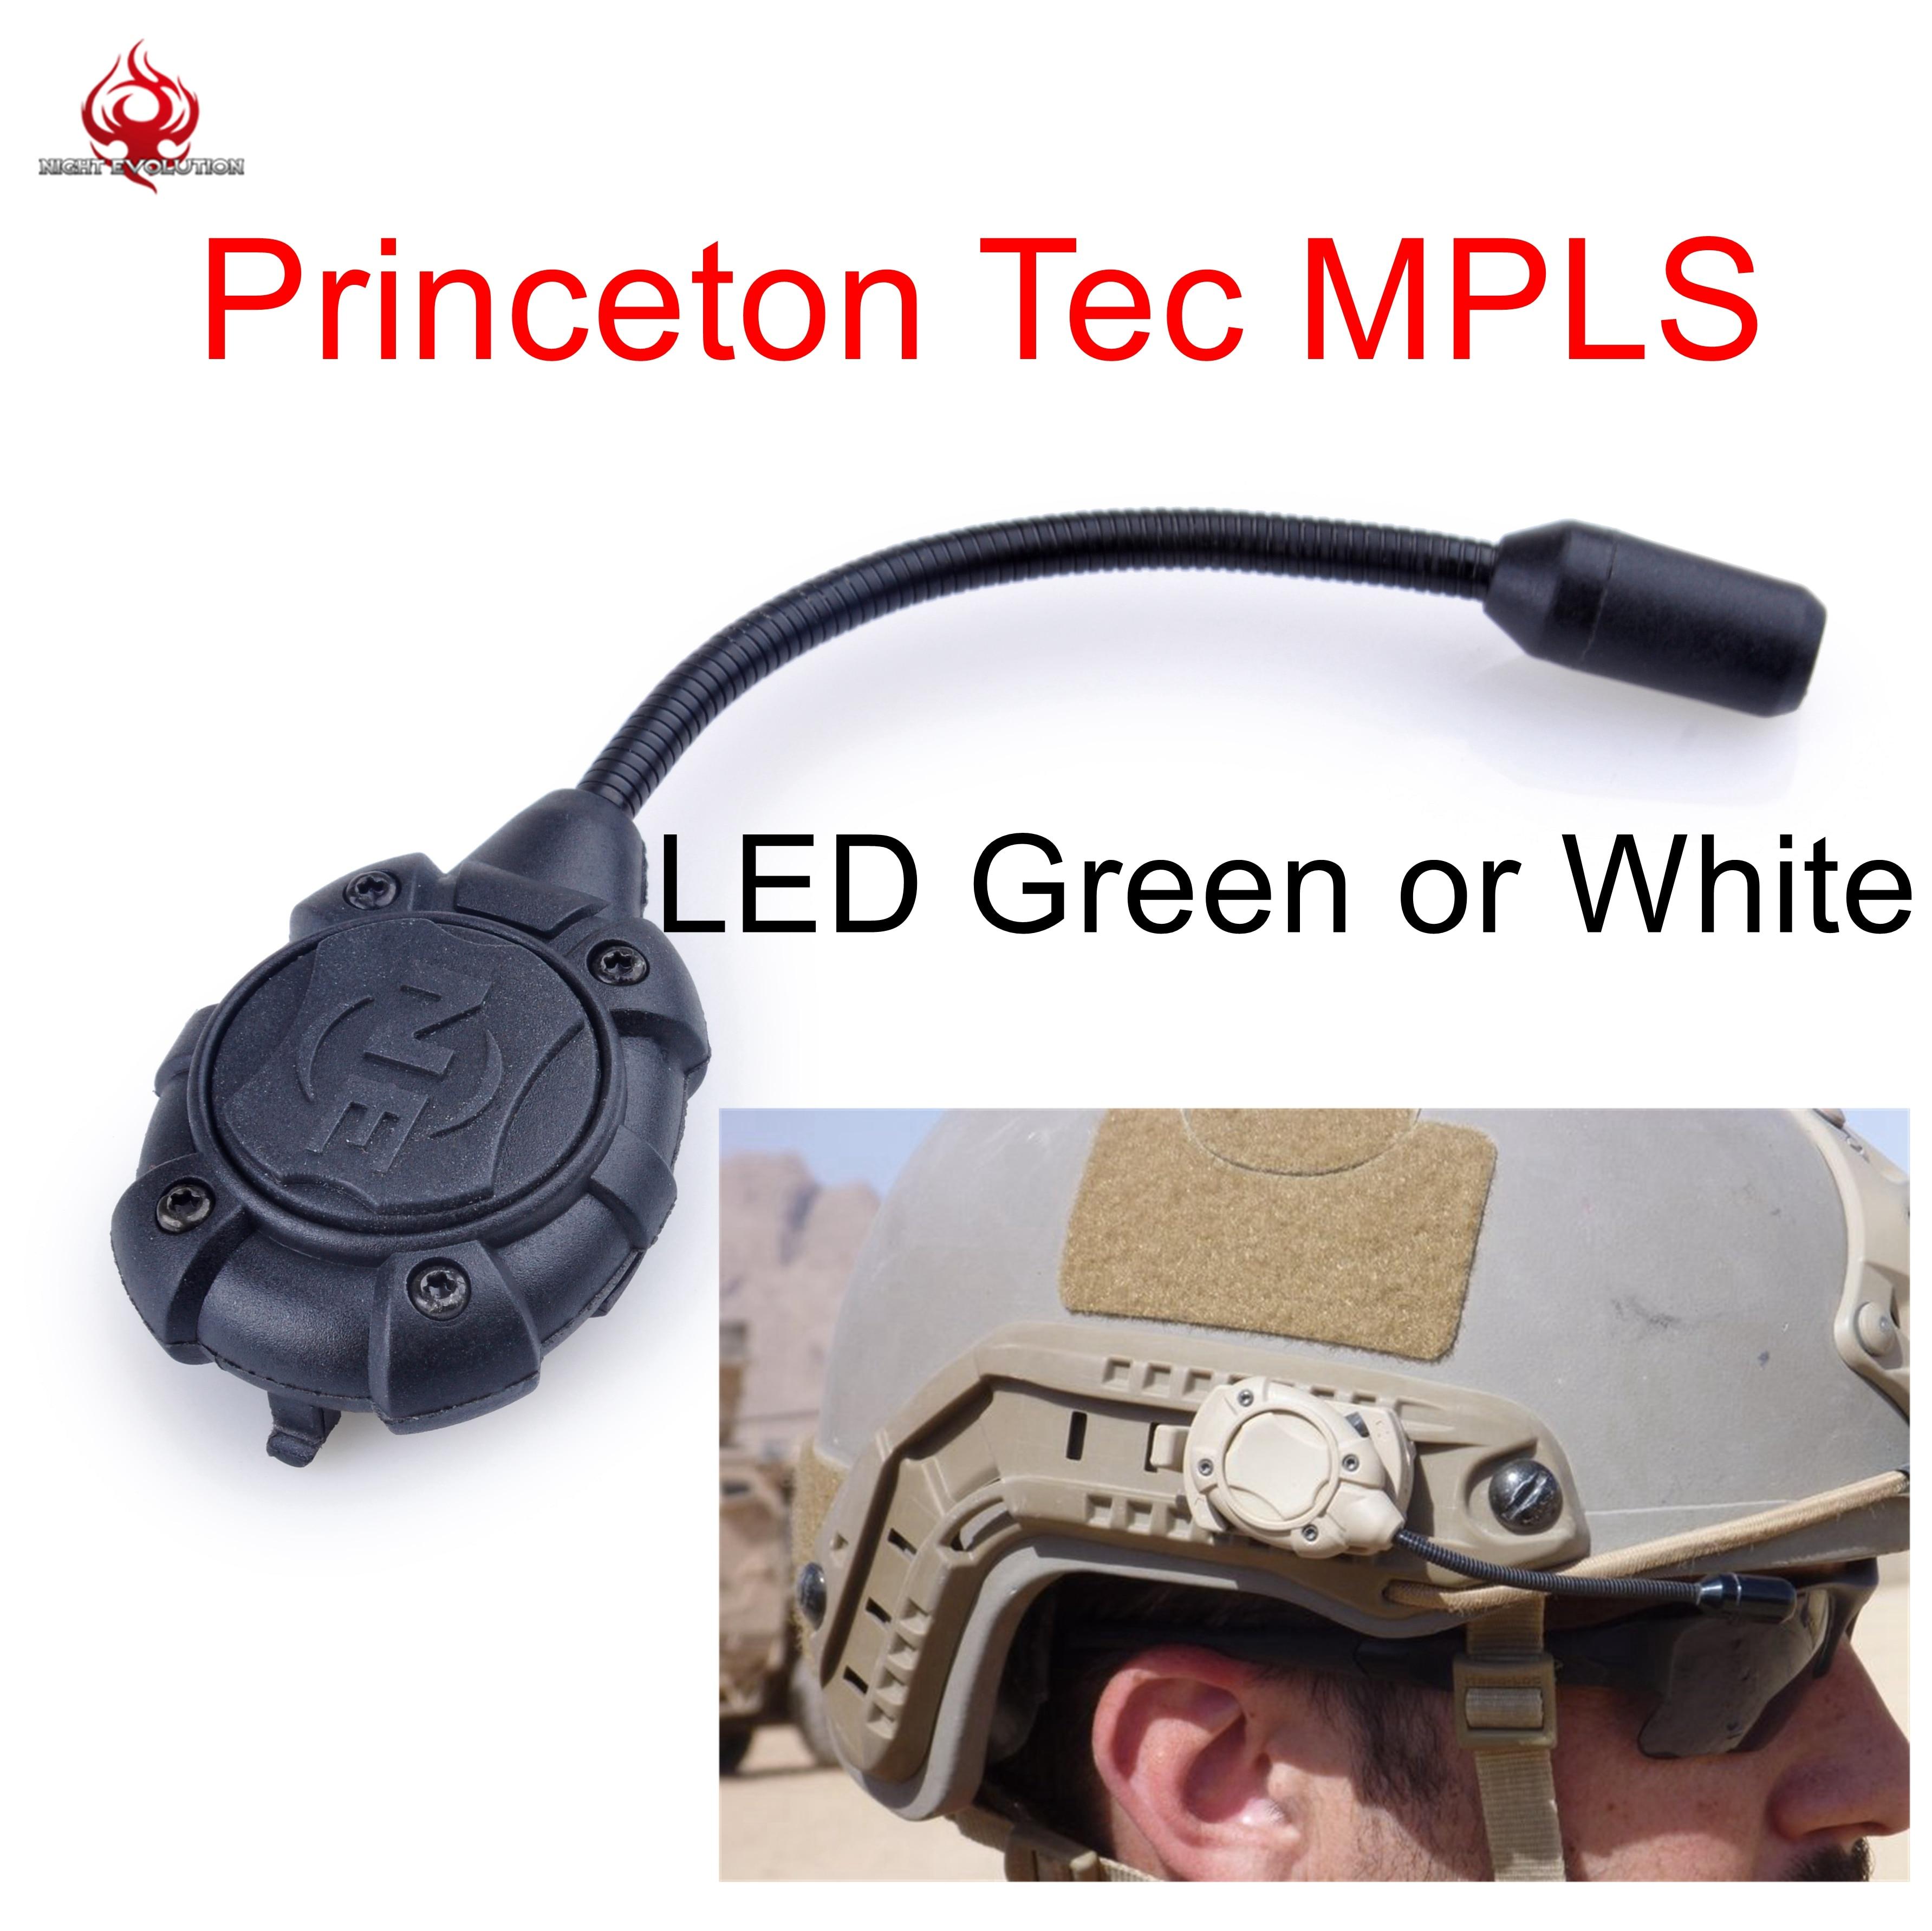 Night Evolution Princeton Tec MPLS Helmet Light Modular w Molle Mount Military Combat Outdoor Flashlight NE